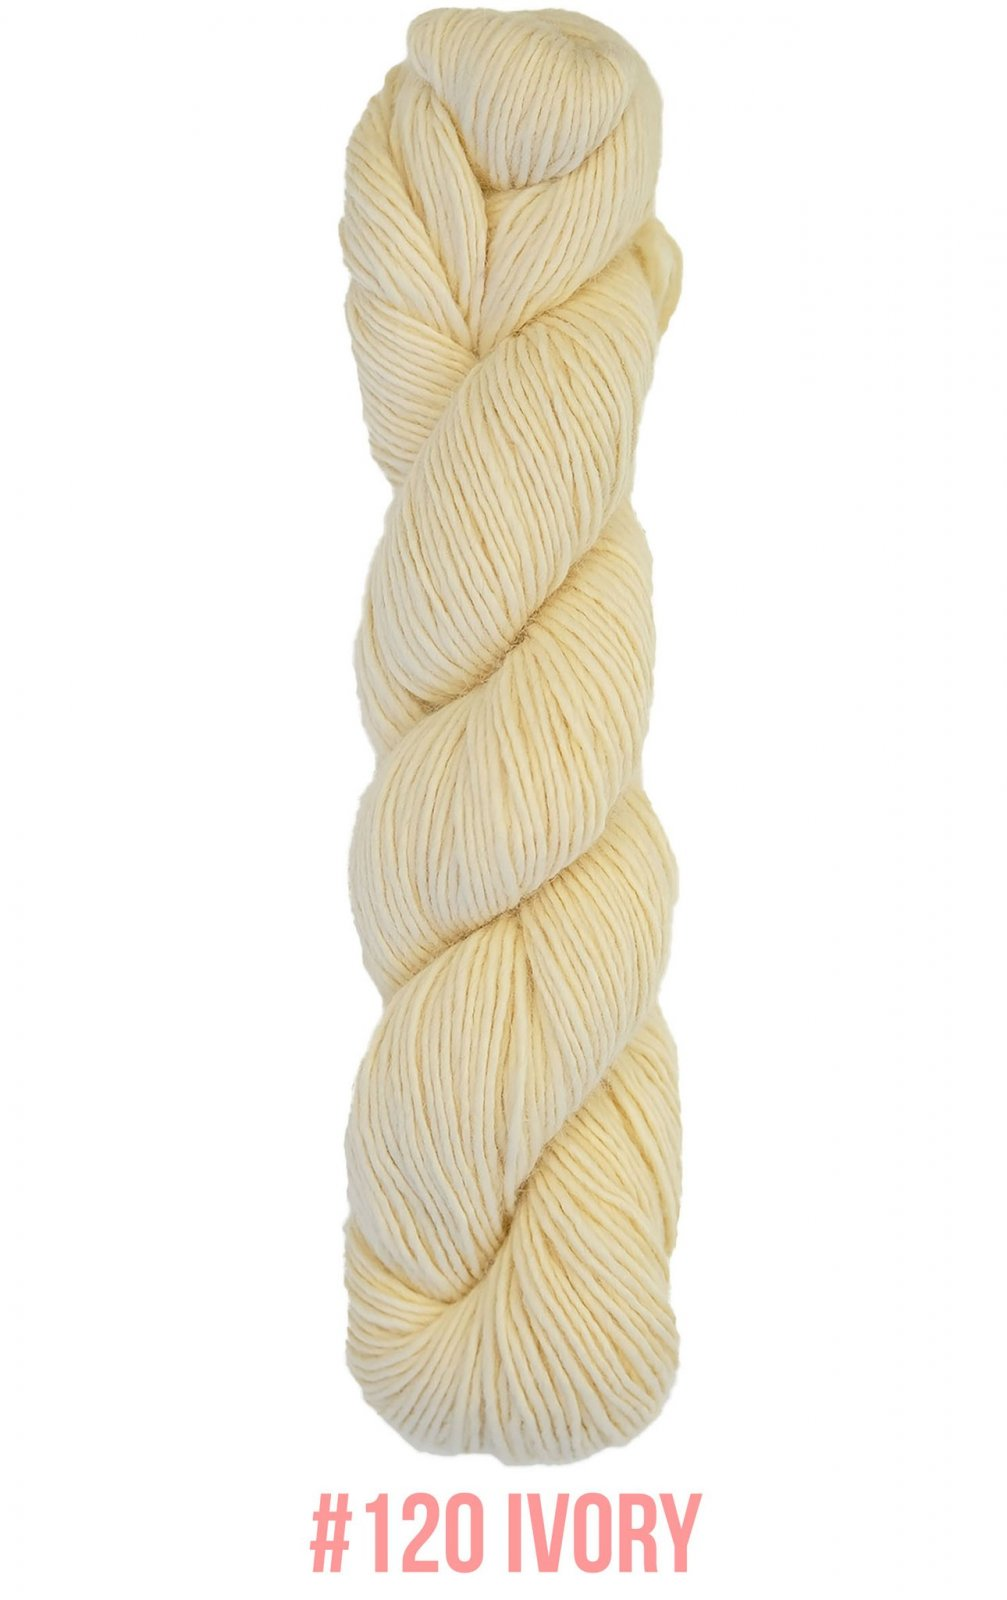 Covet-Knit ONE crochet too